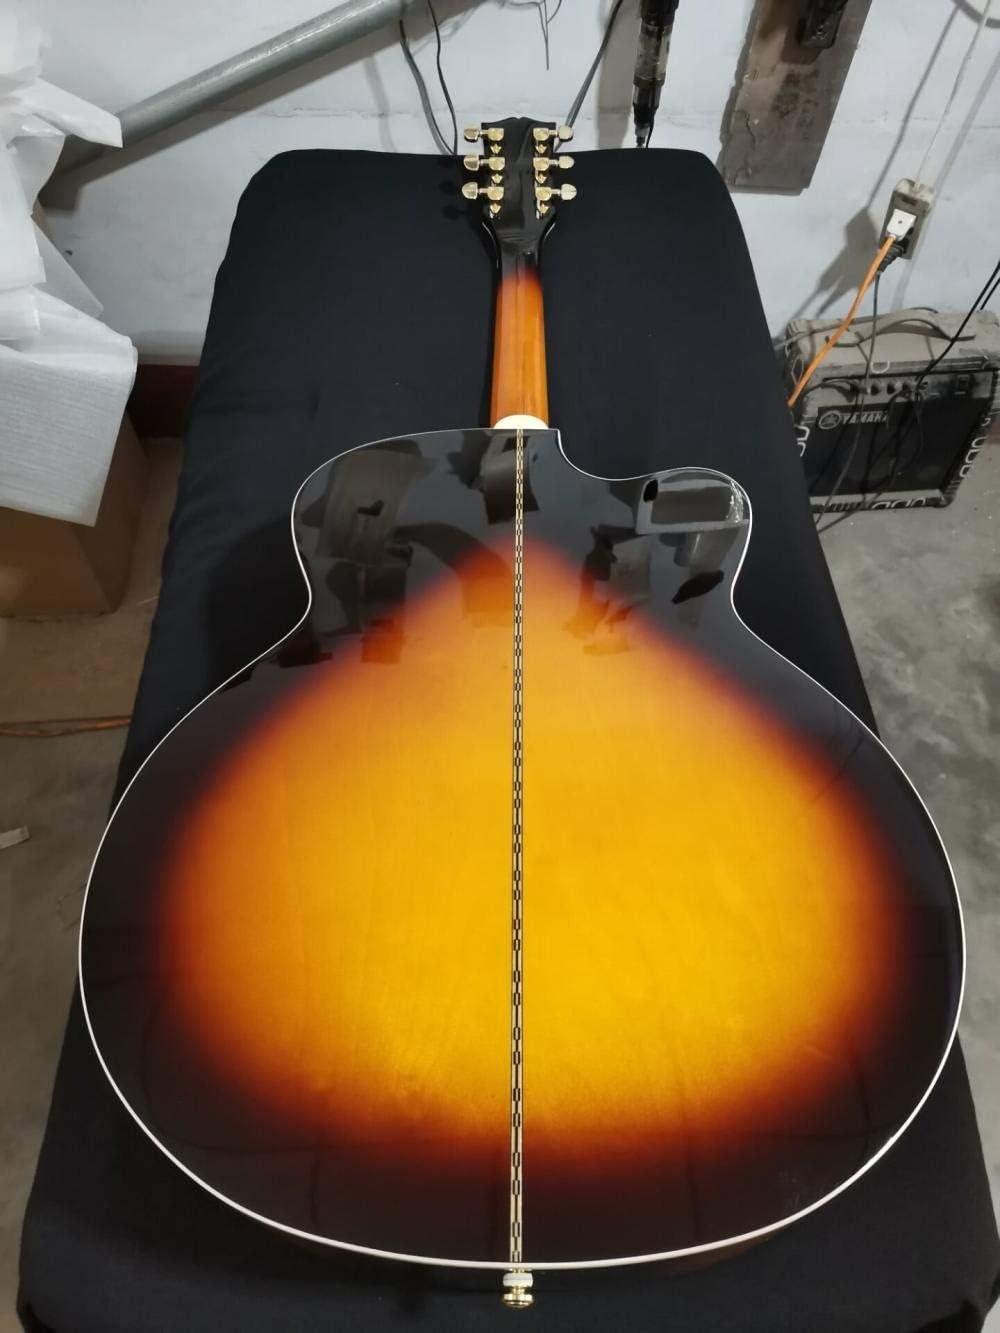 Florwesr Guitarra De Cuerpo Jumbo 43 Pulgadas Guitarra Acústica ...